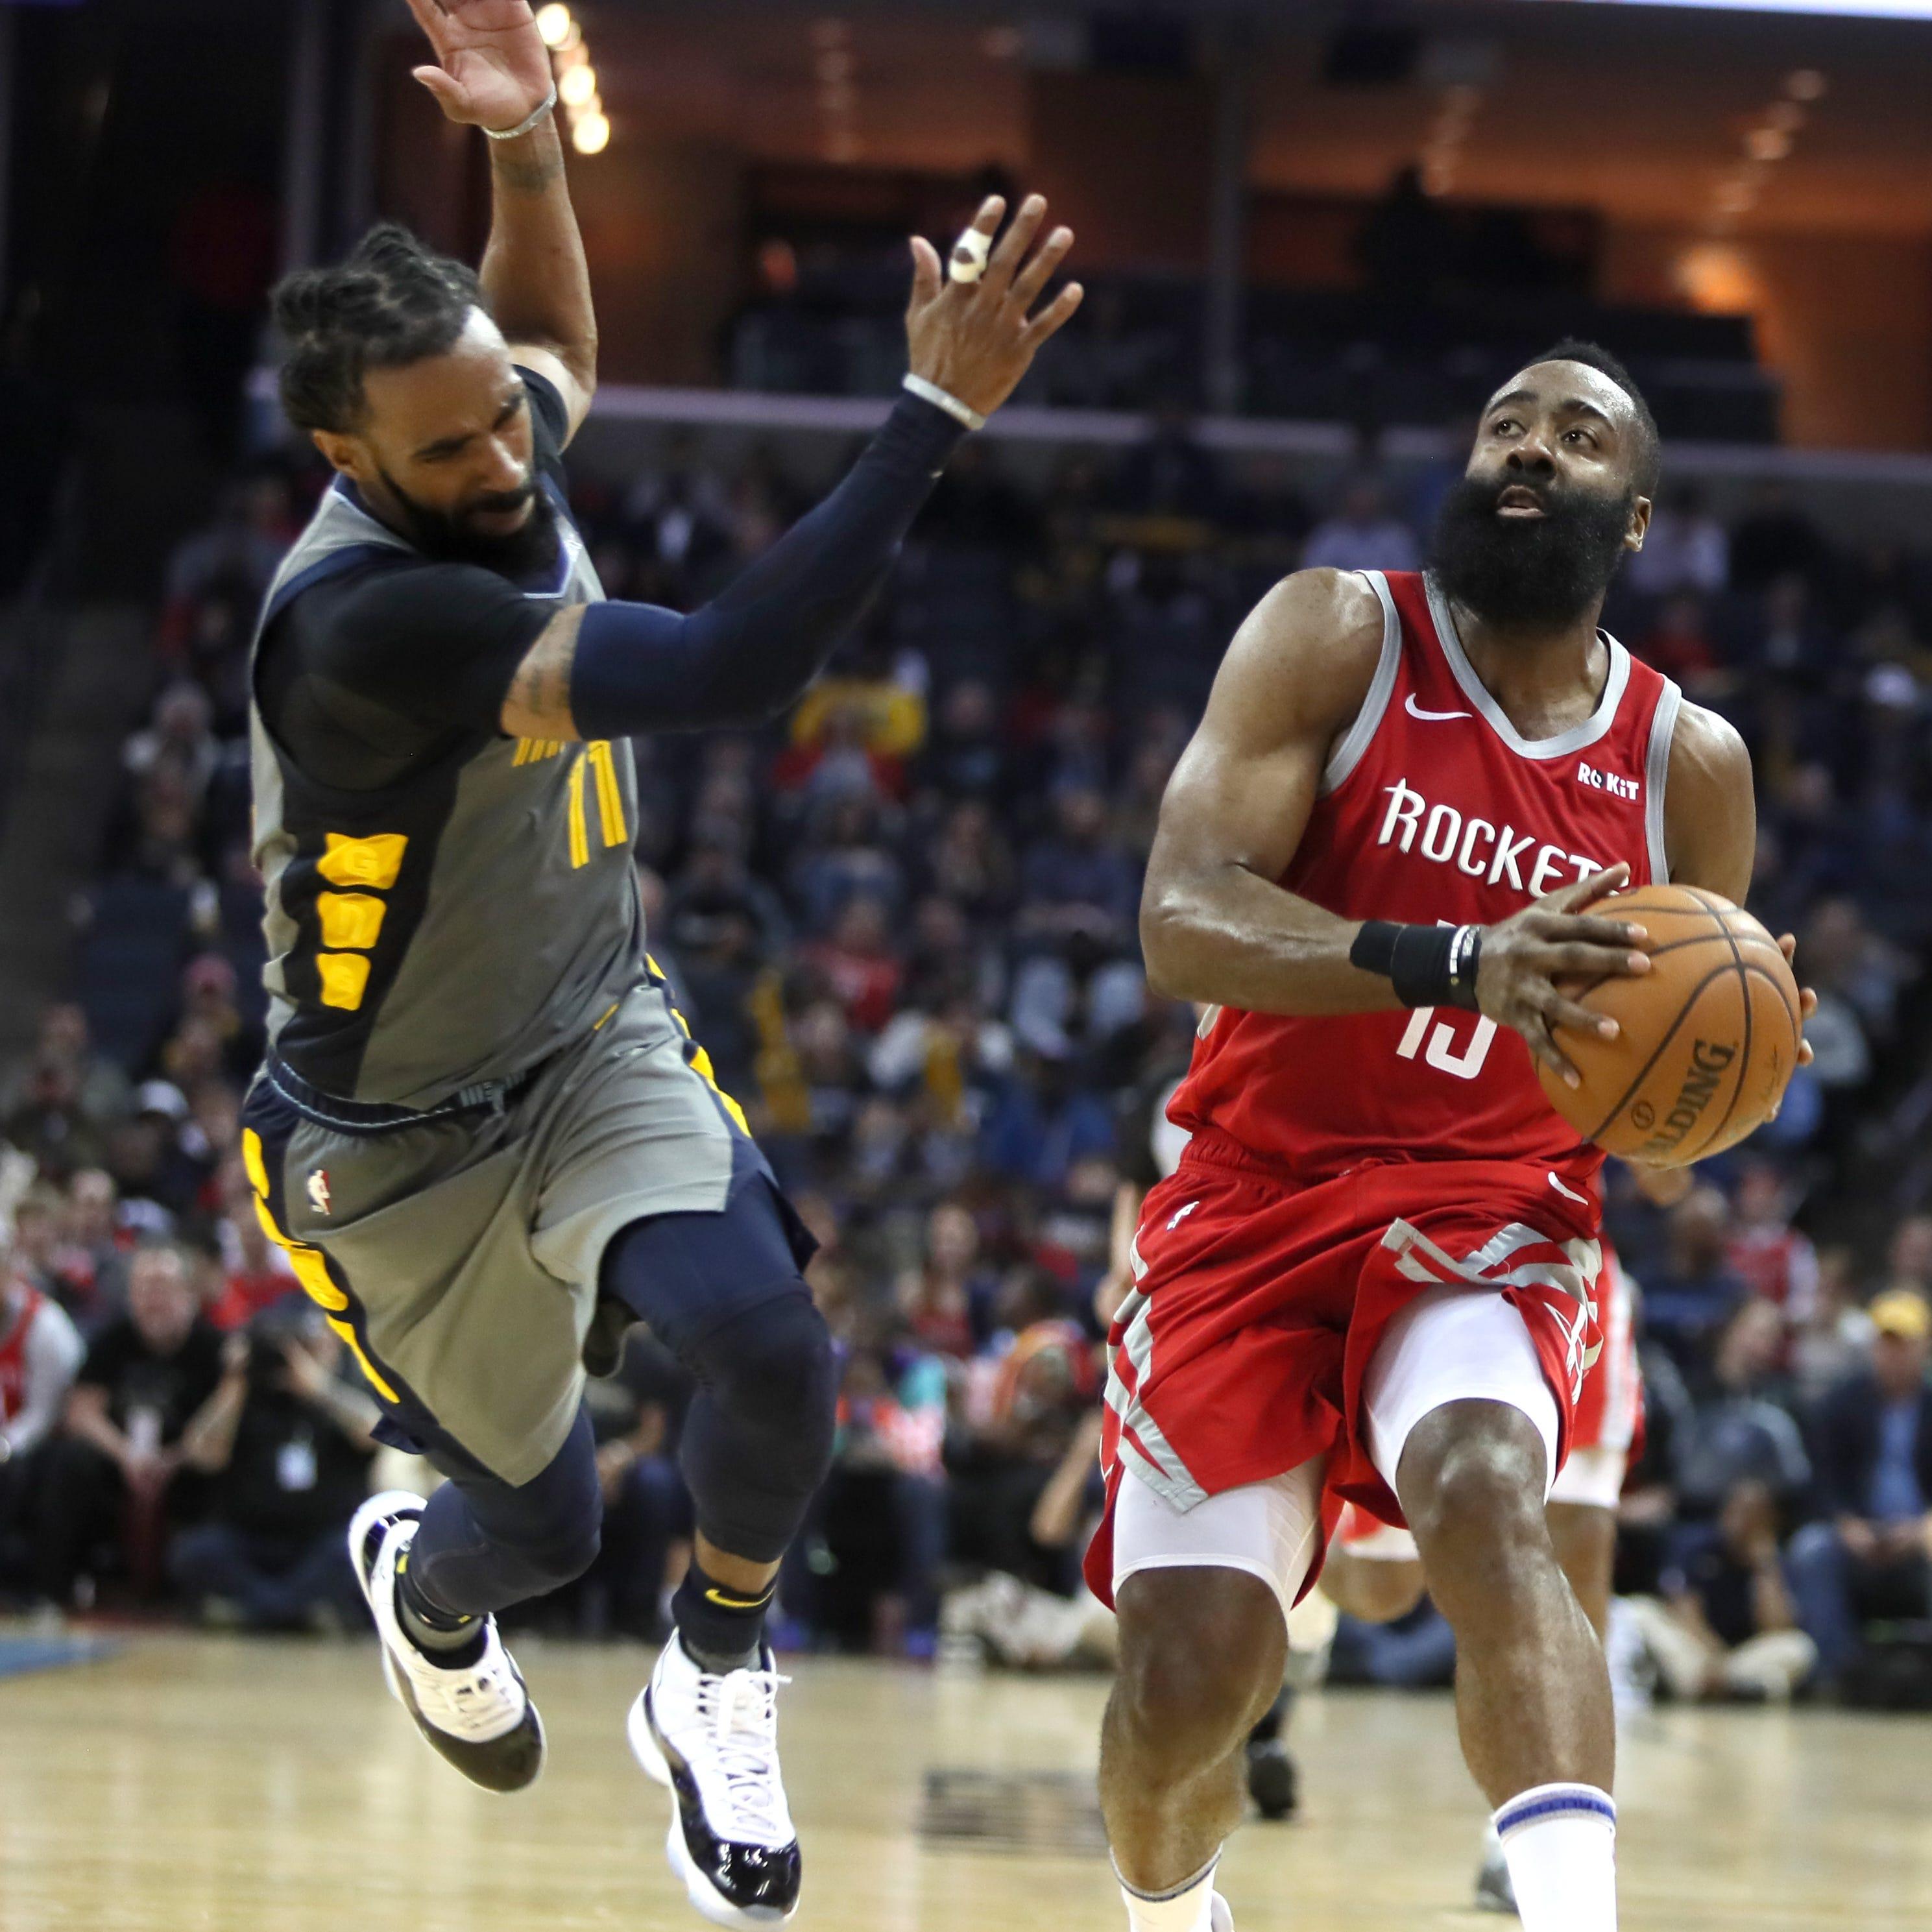 Memphis Grizzlies match their own NBA record in futile category vs. Dallas Mavericks